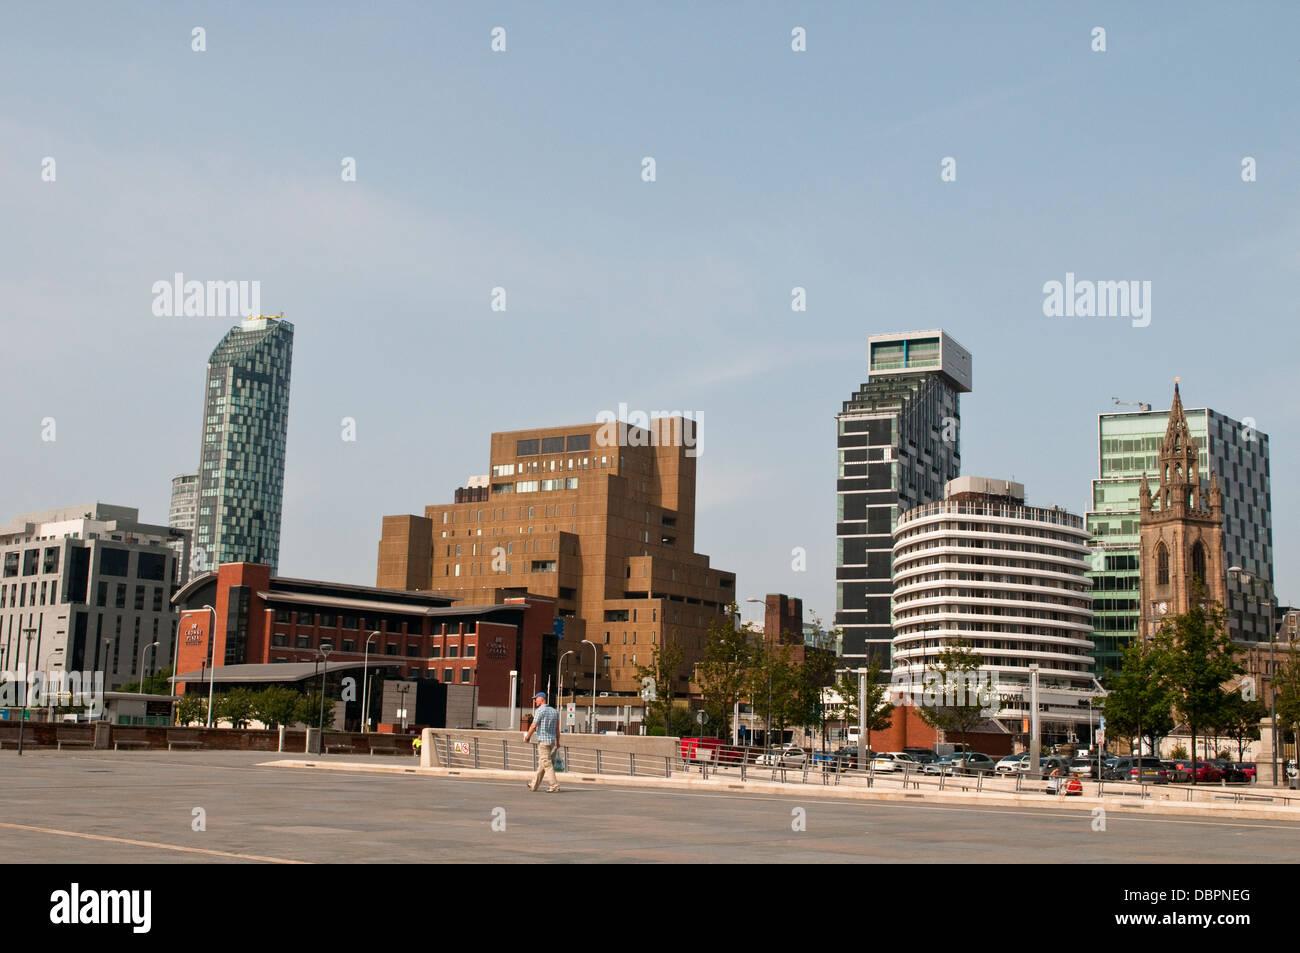 Buildings along New Quay Street, Liverpool, UK - Stock Image